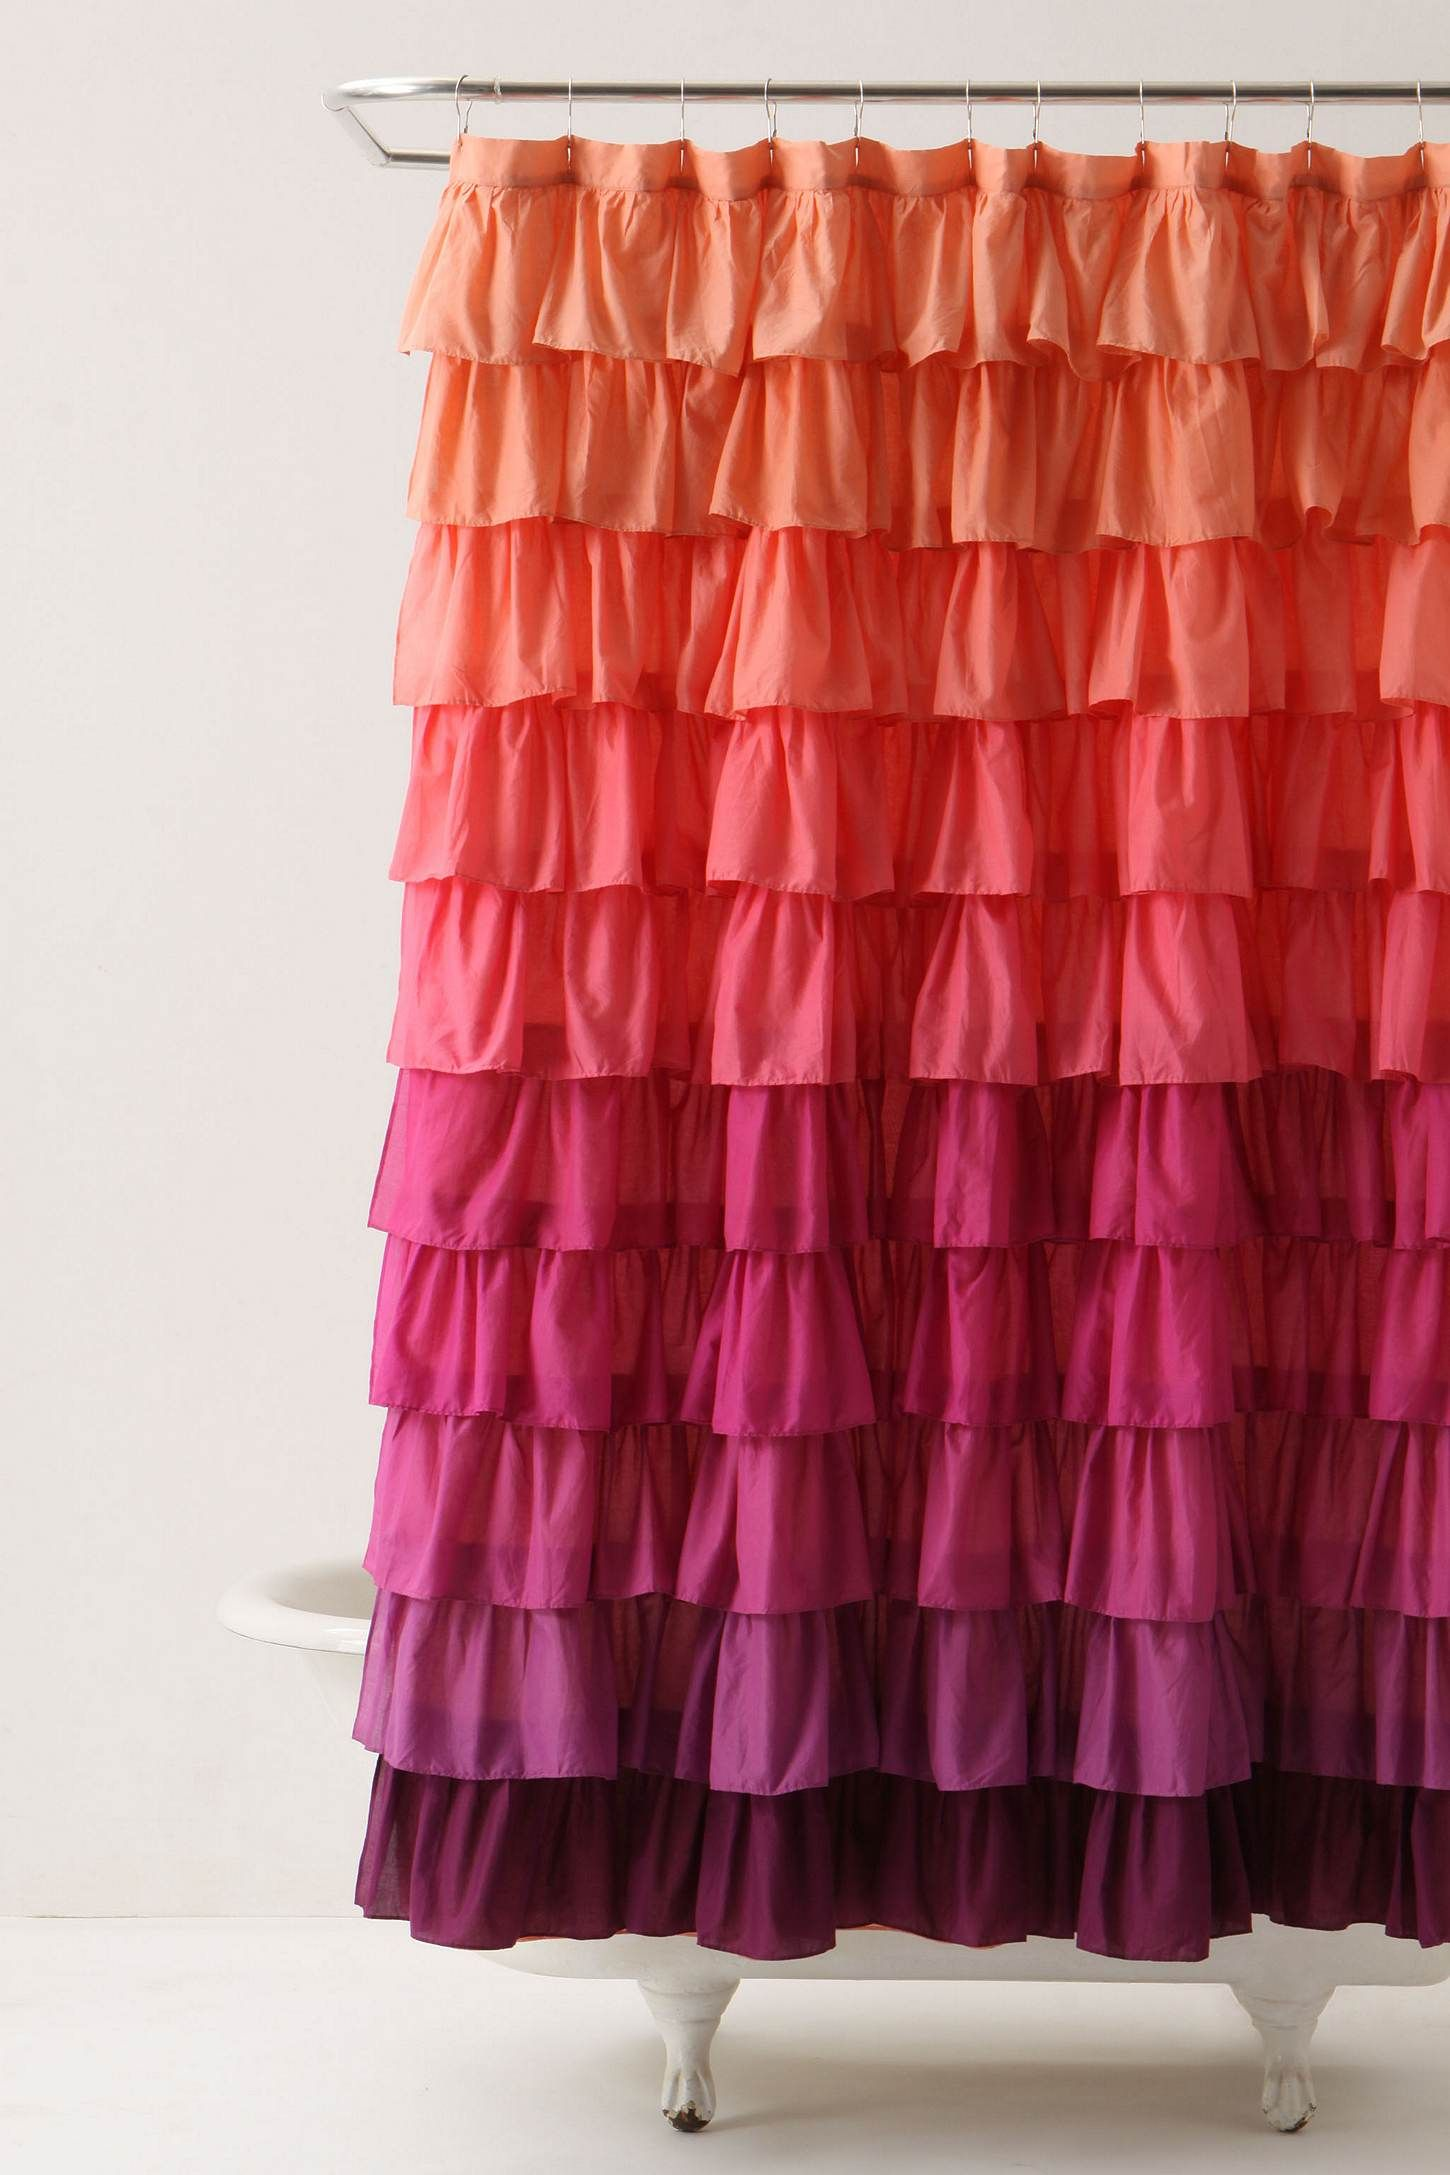 Smoldering Hues Shower Curtain Ruffle Shower Curtains Ombre Shower Curtain Cute Shower Curtains